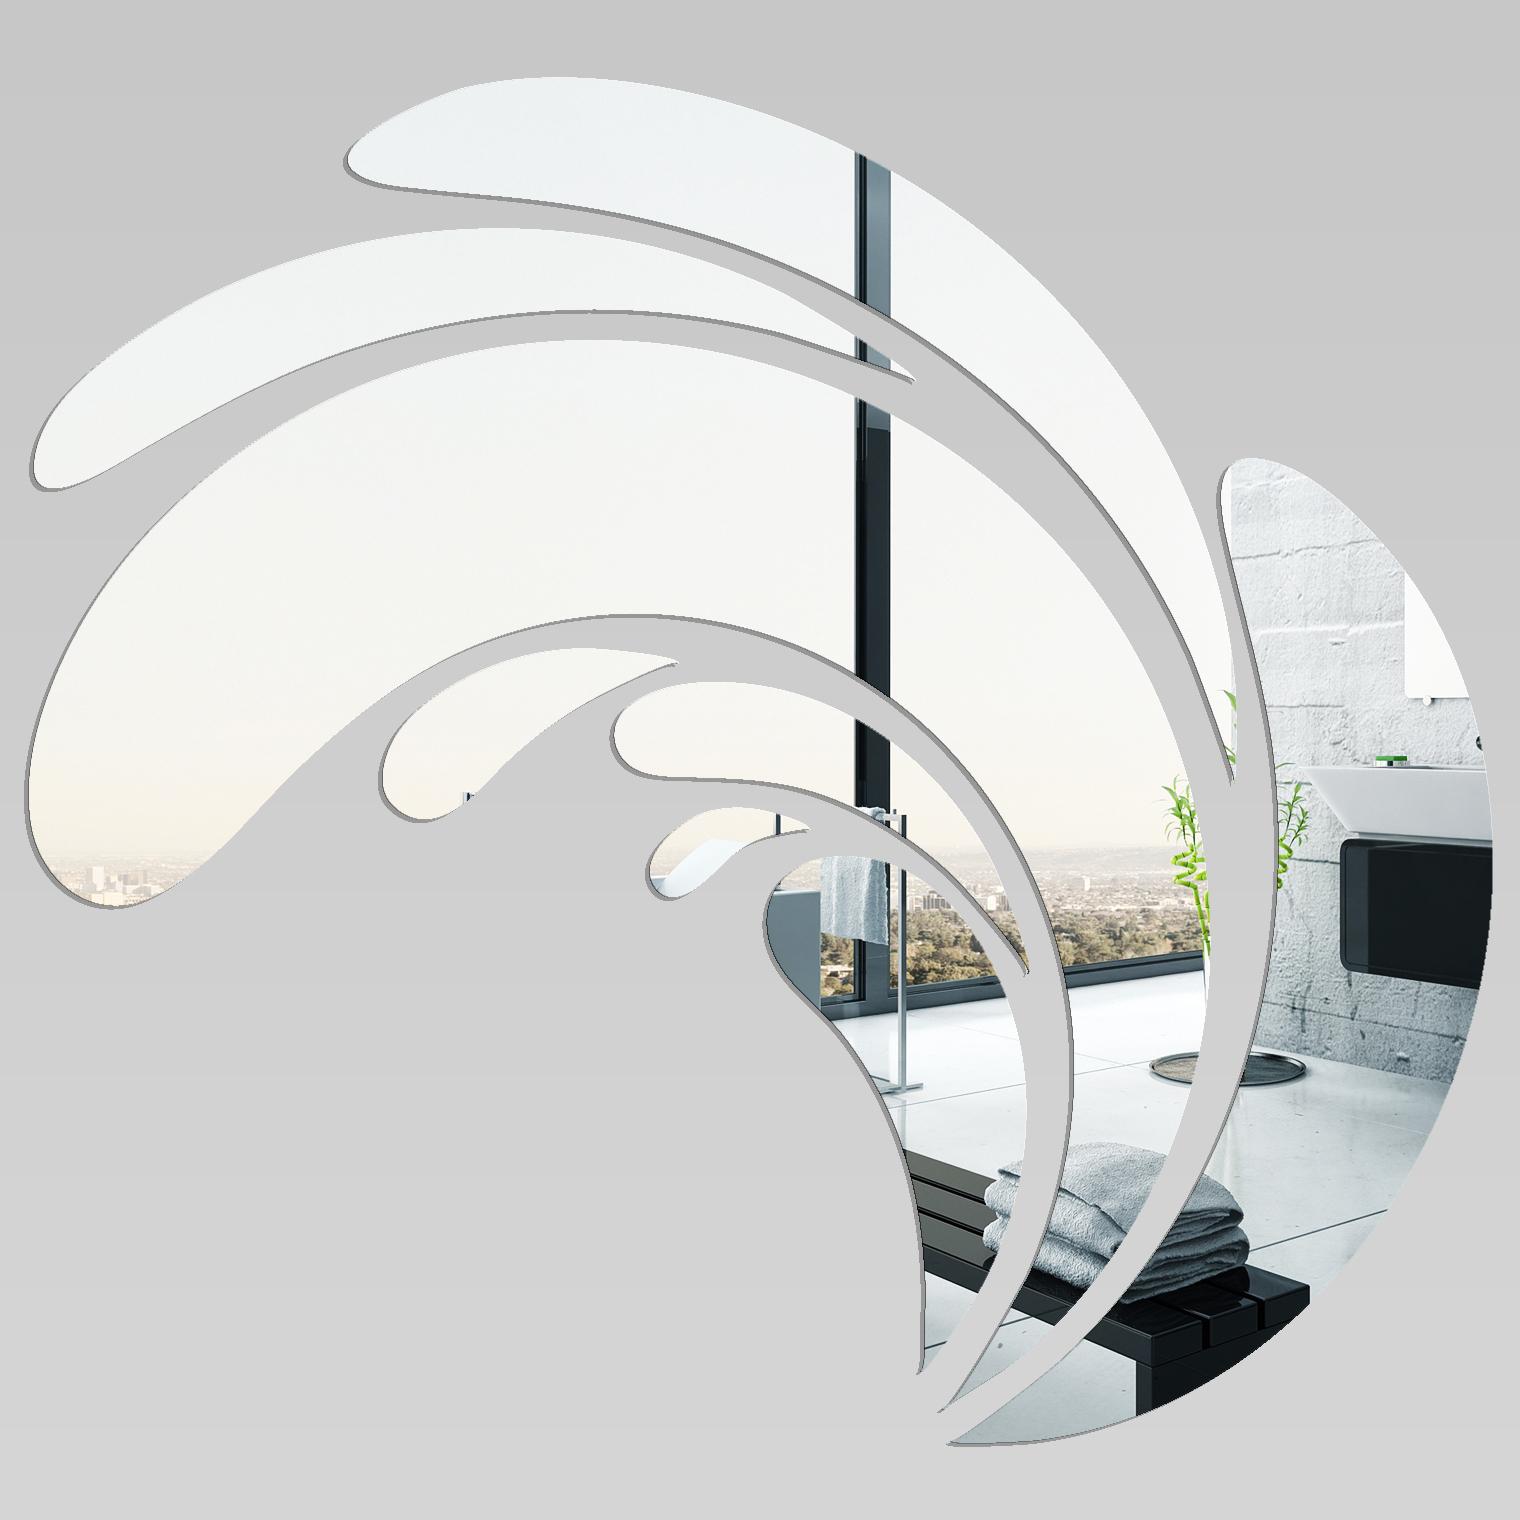 Miroir plexiglass acrylique design pas cher for Miroir acrylique